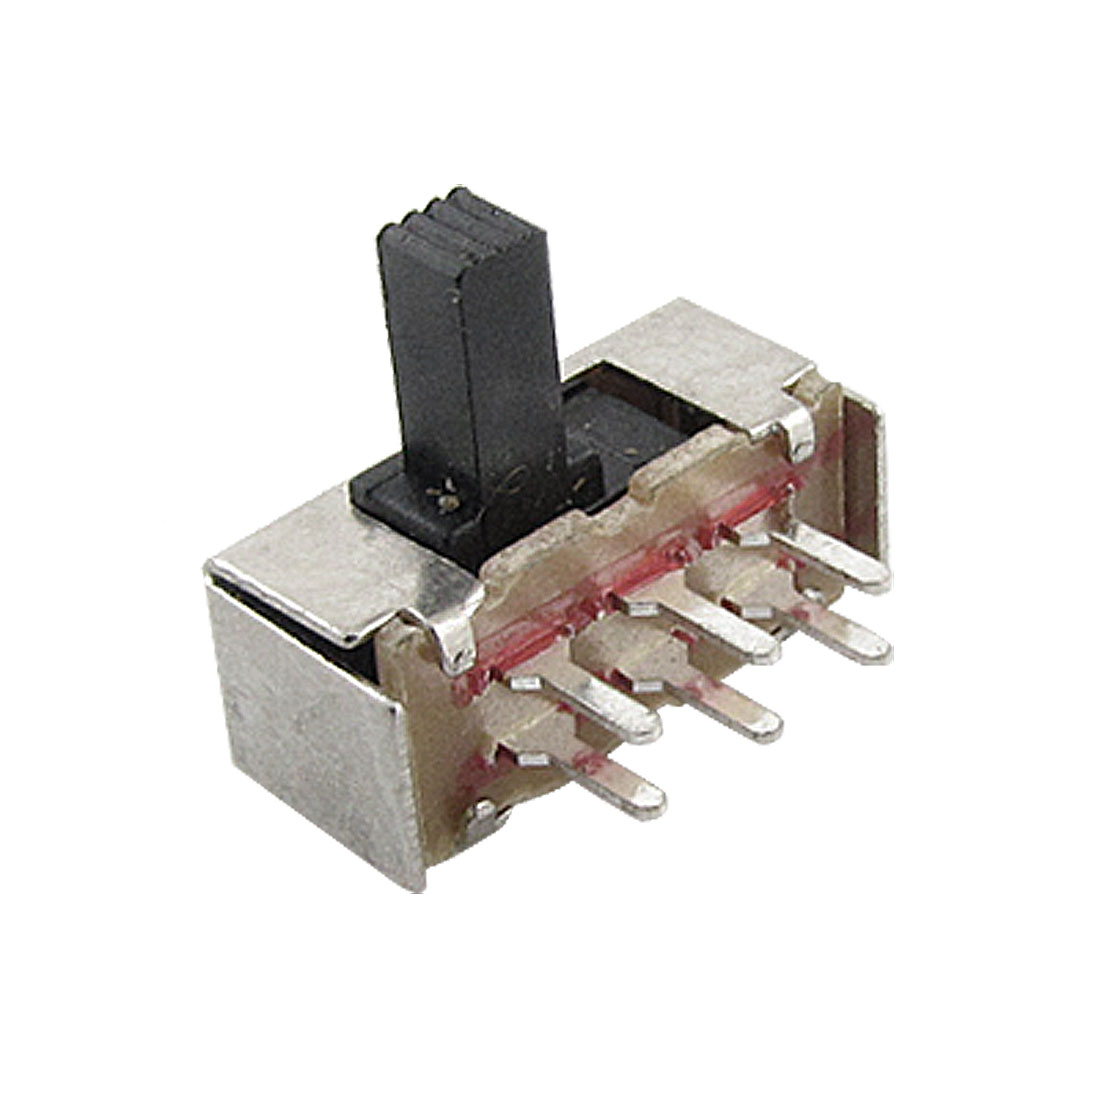 10 Pcs x 7mm High Side Knob 6 Pin 2 Position DPDT 2P2T Slide Switch 0.5A 50V DC